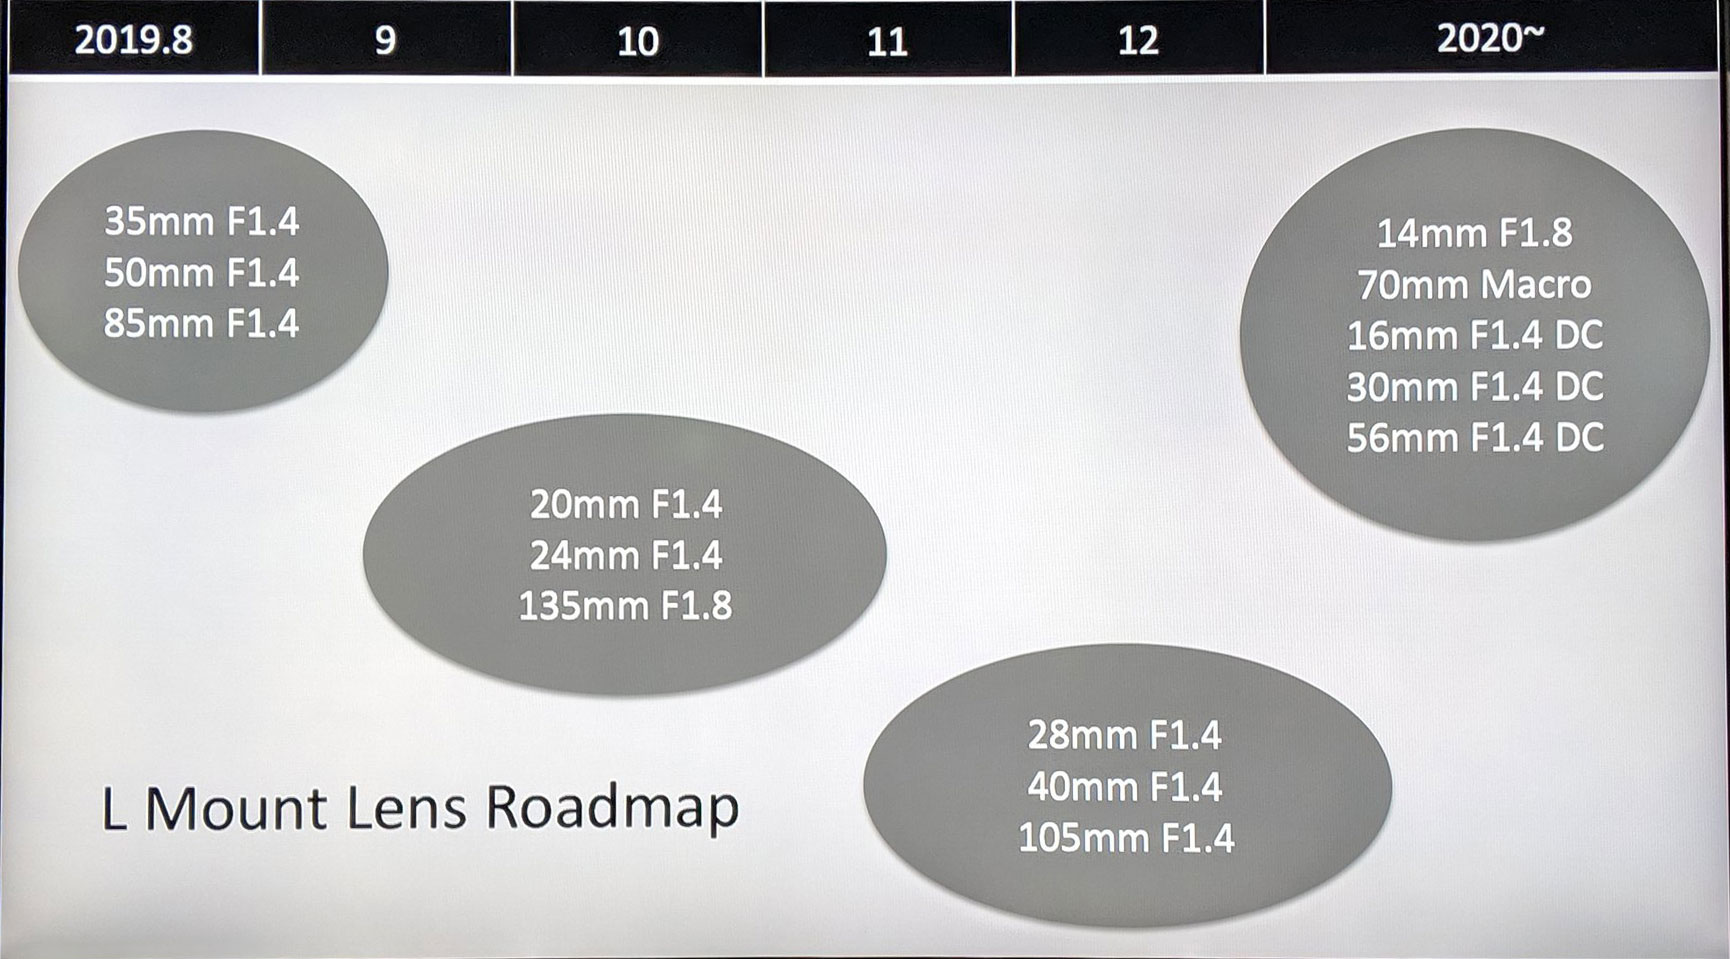 Sigma updates L-mount lens roadmap through 2020: Digital